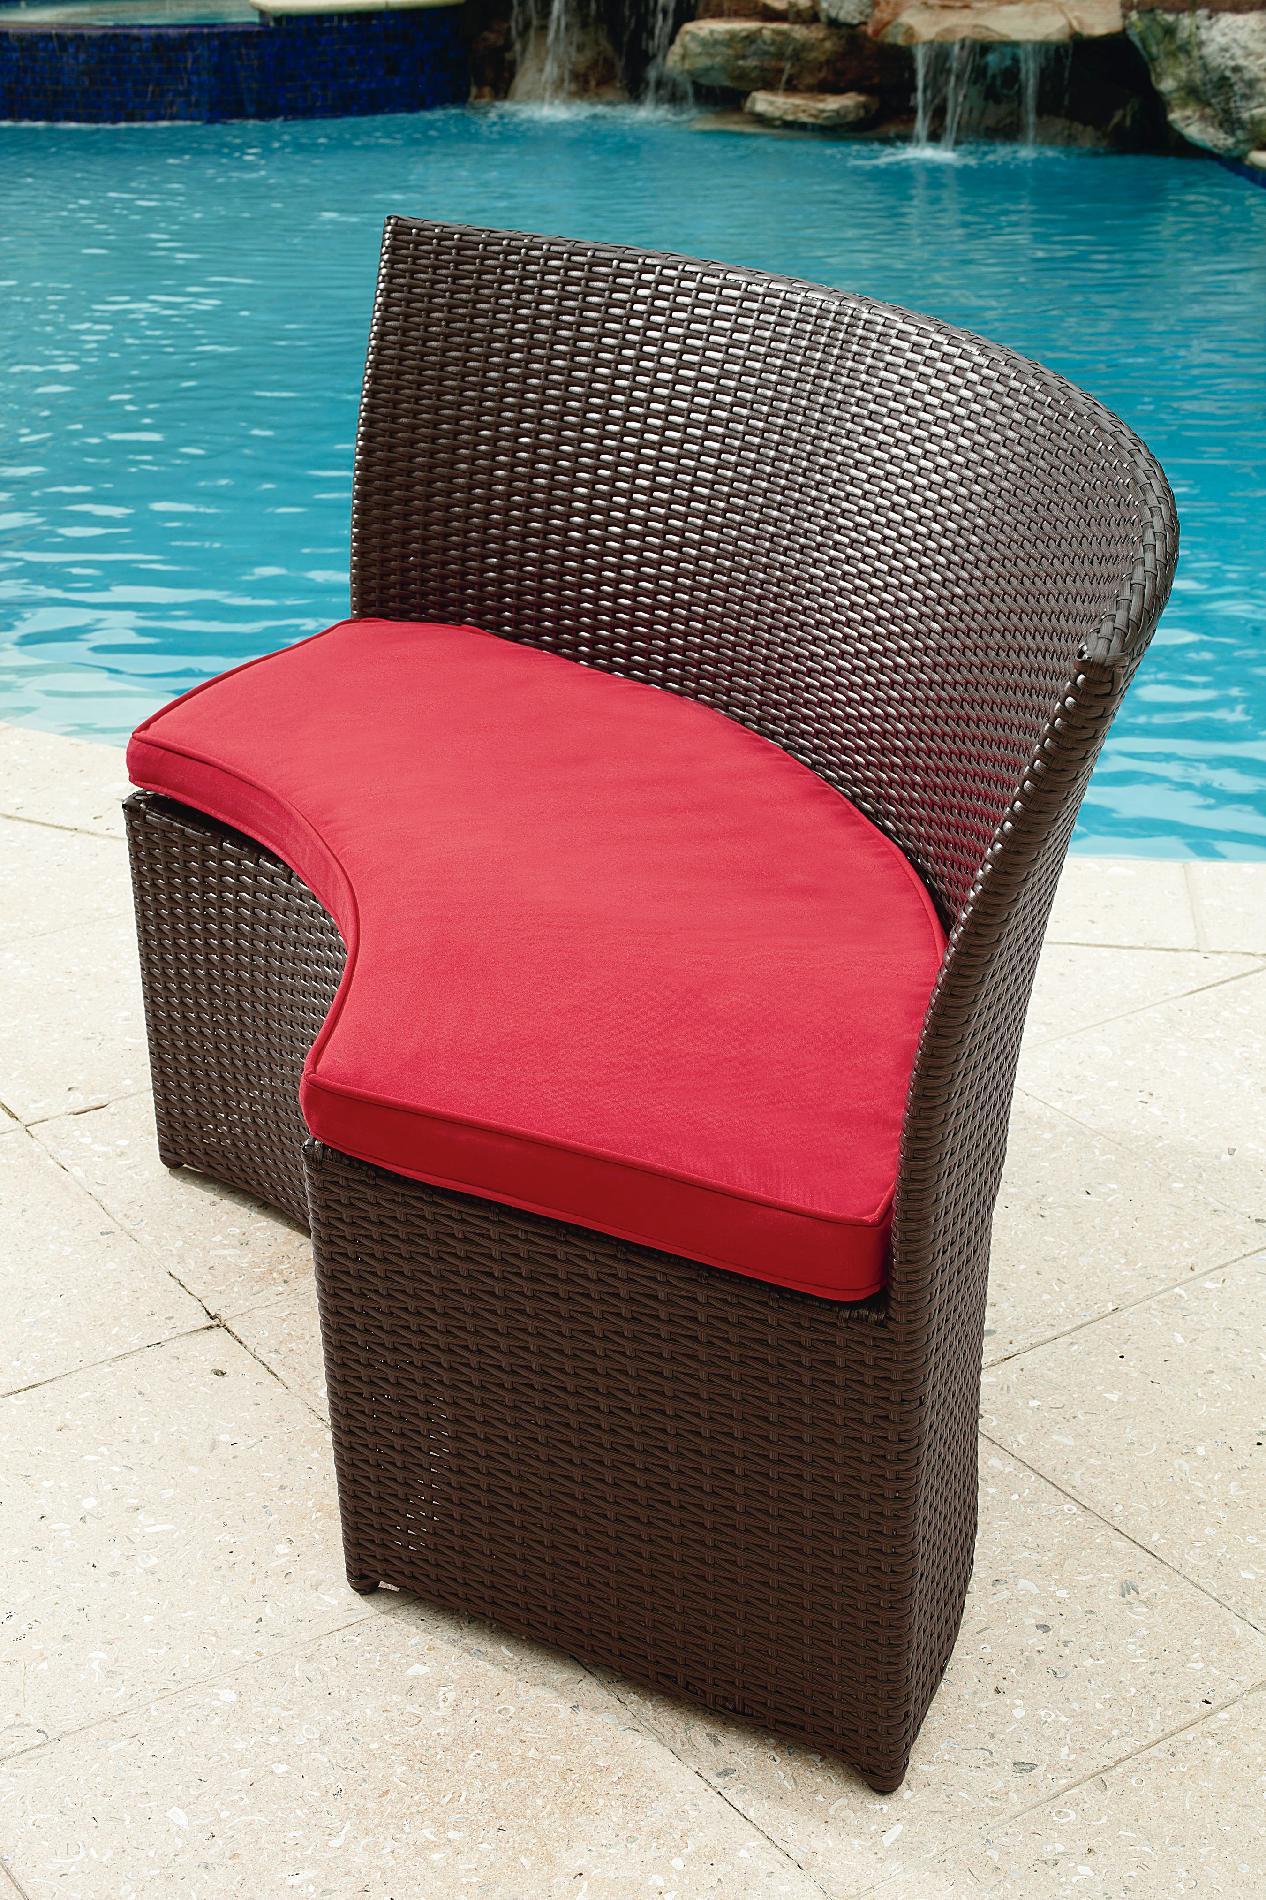 Grand Resort Osborn 7 Piece Round Dining Set Featuring Sunbrella&reg Fabric *Limited Availability